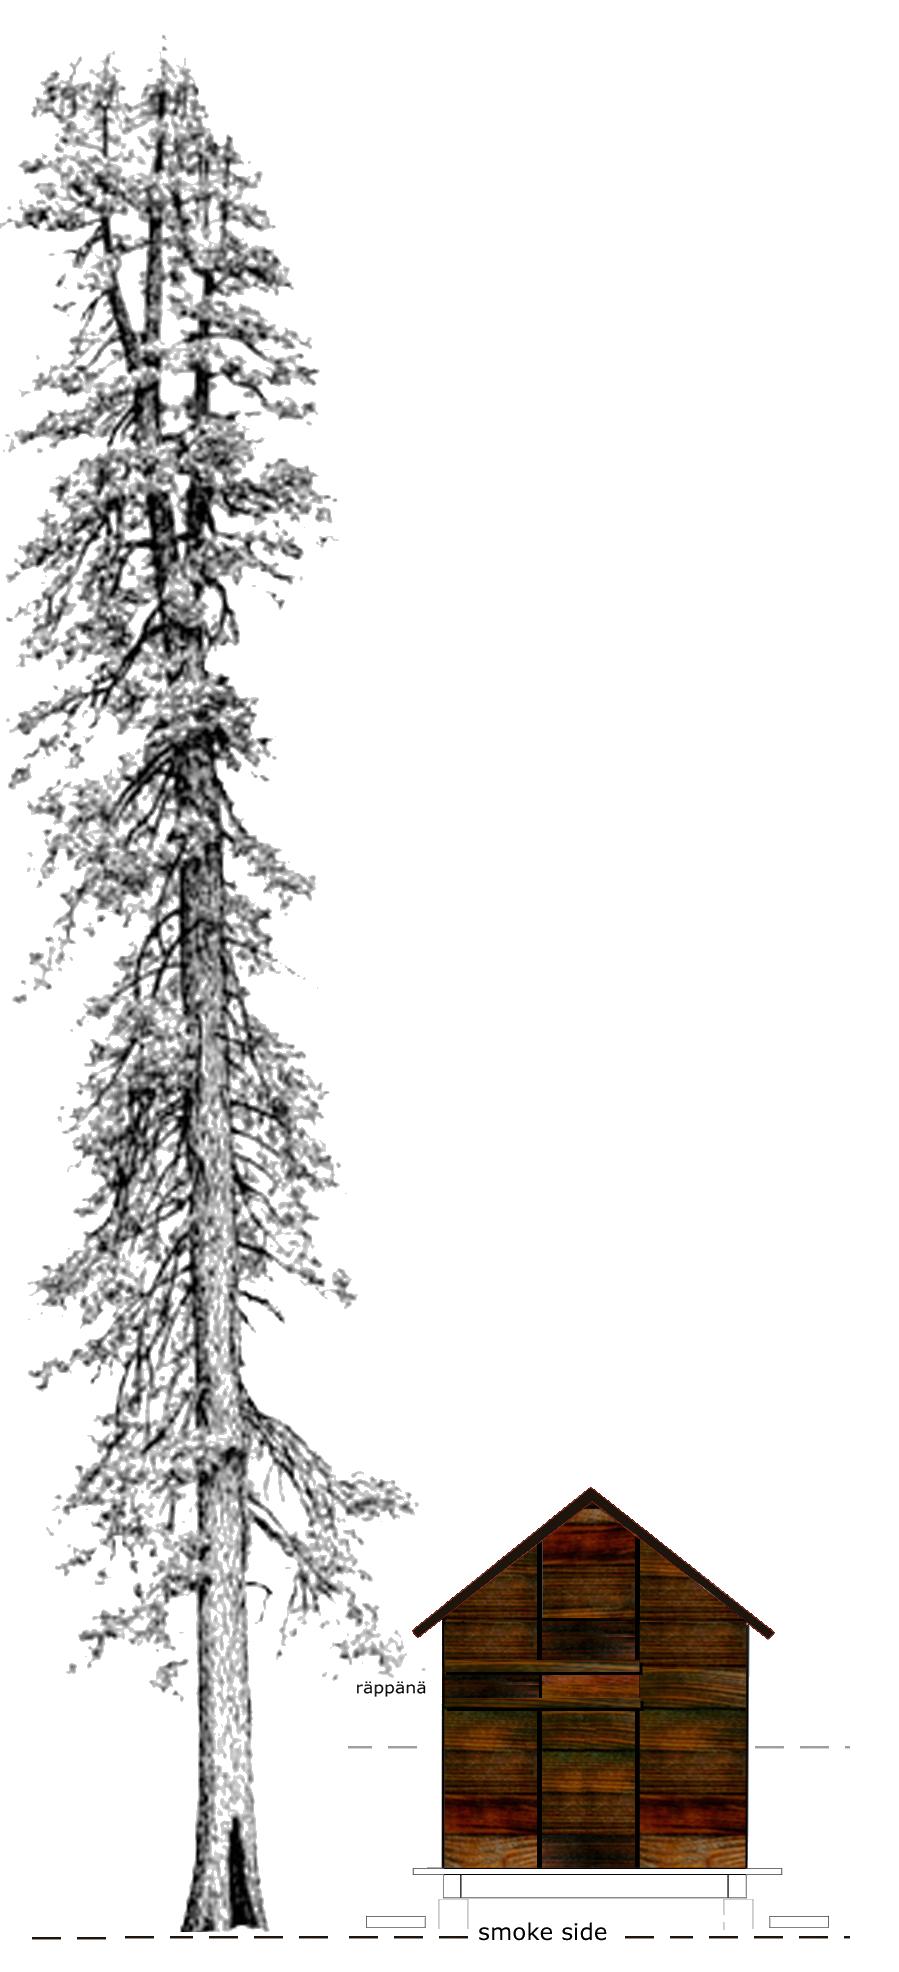 SAUNA_SIDE_ELEV_TREE.png